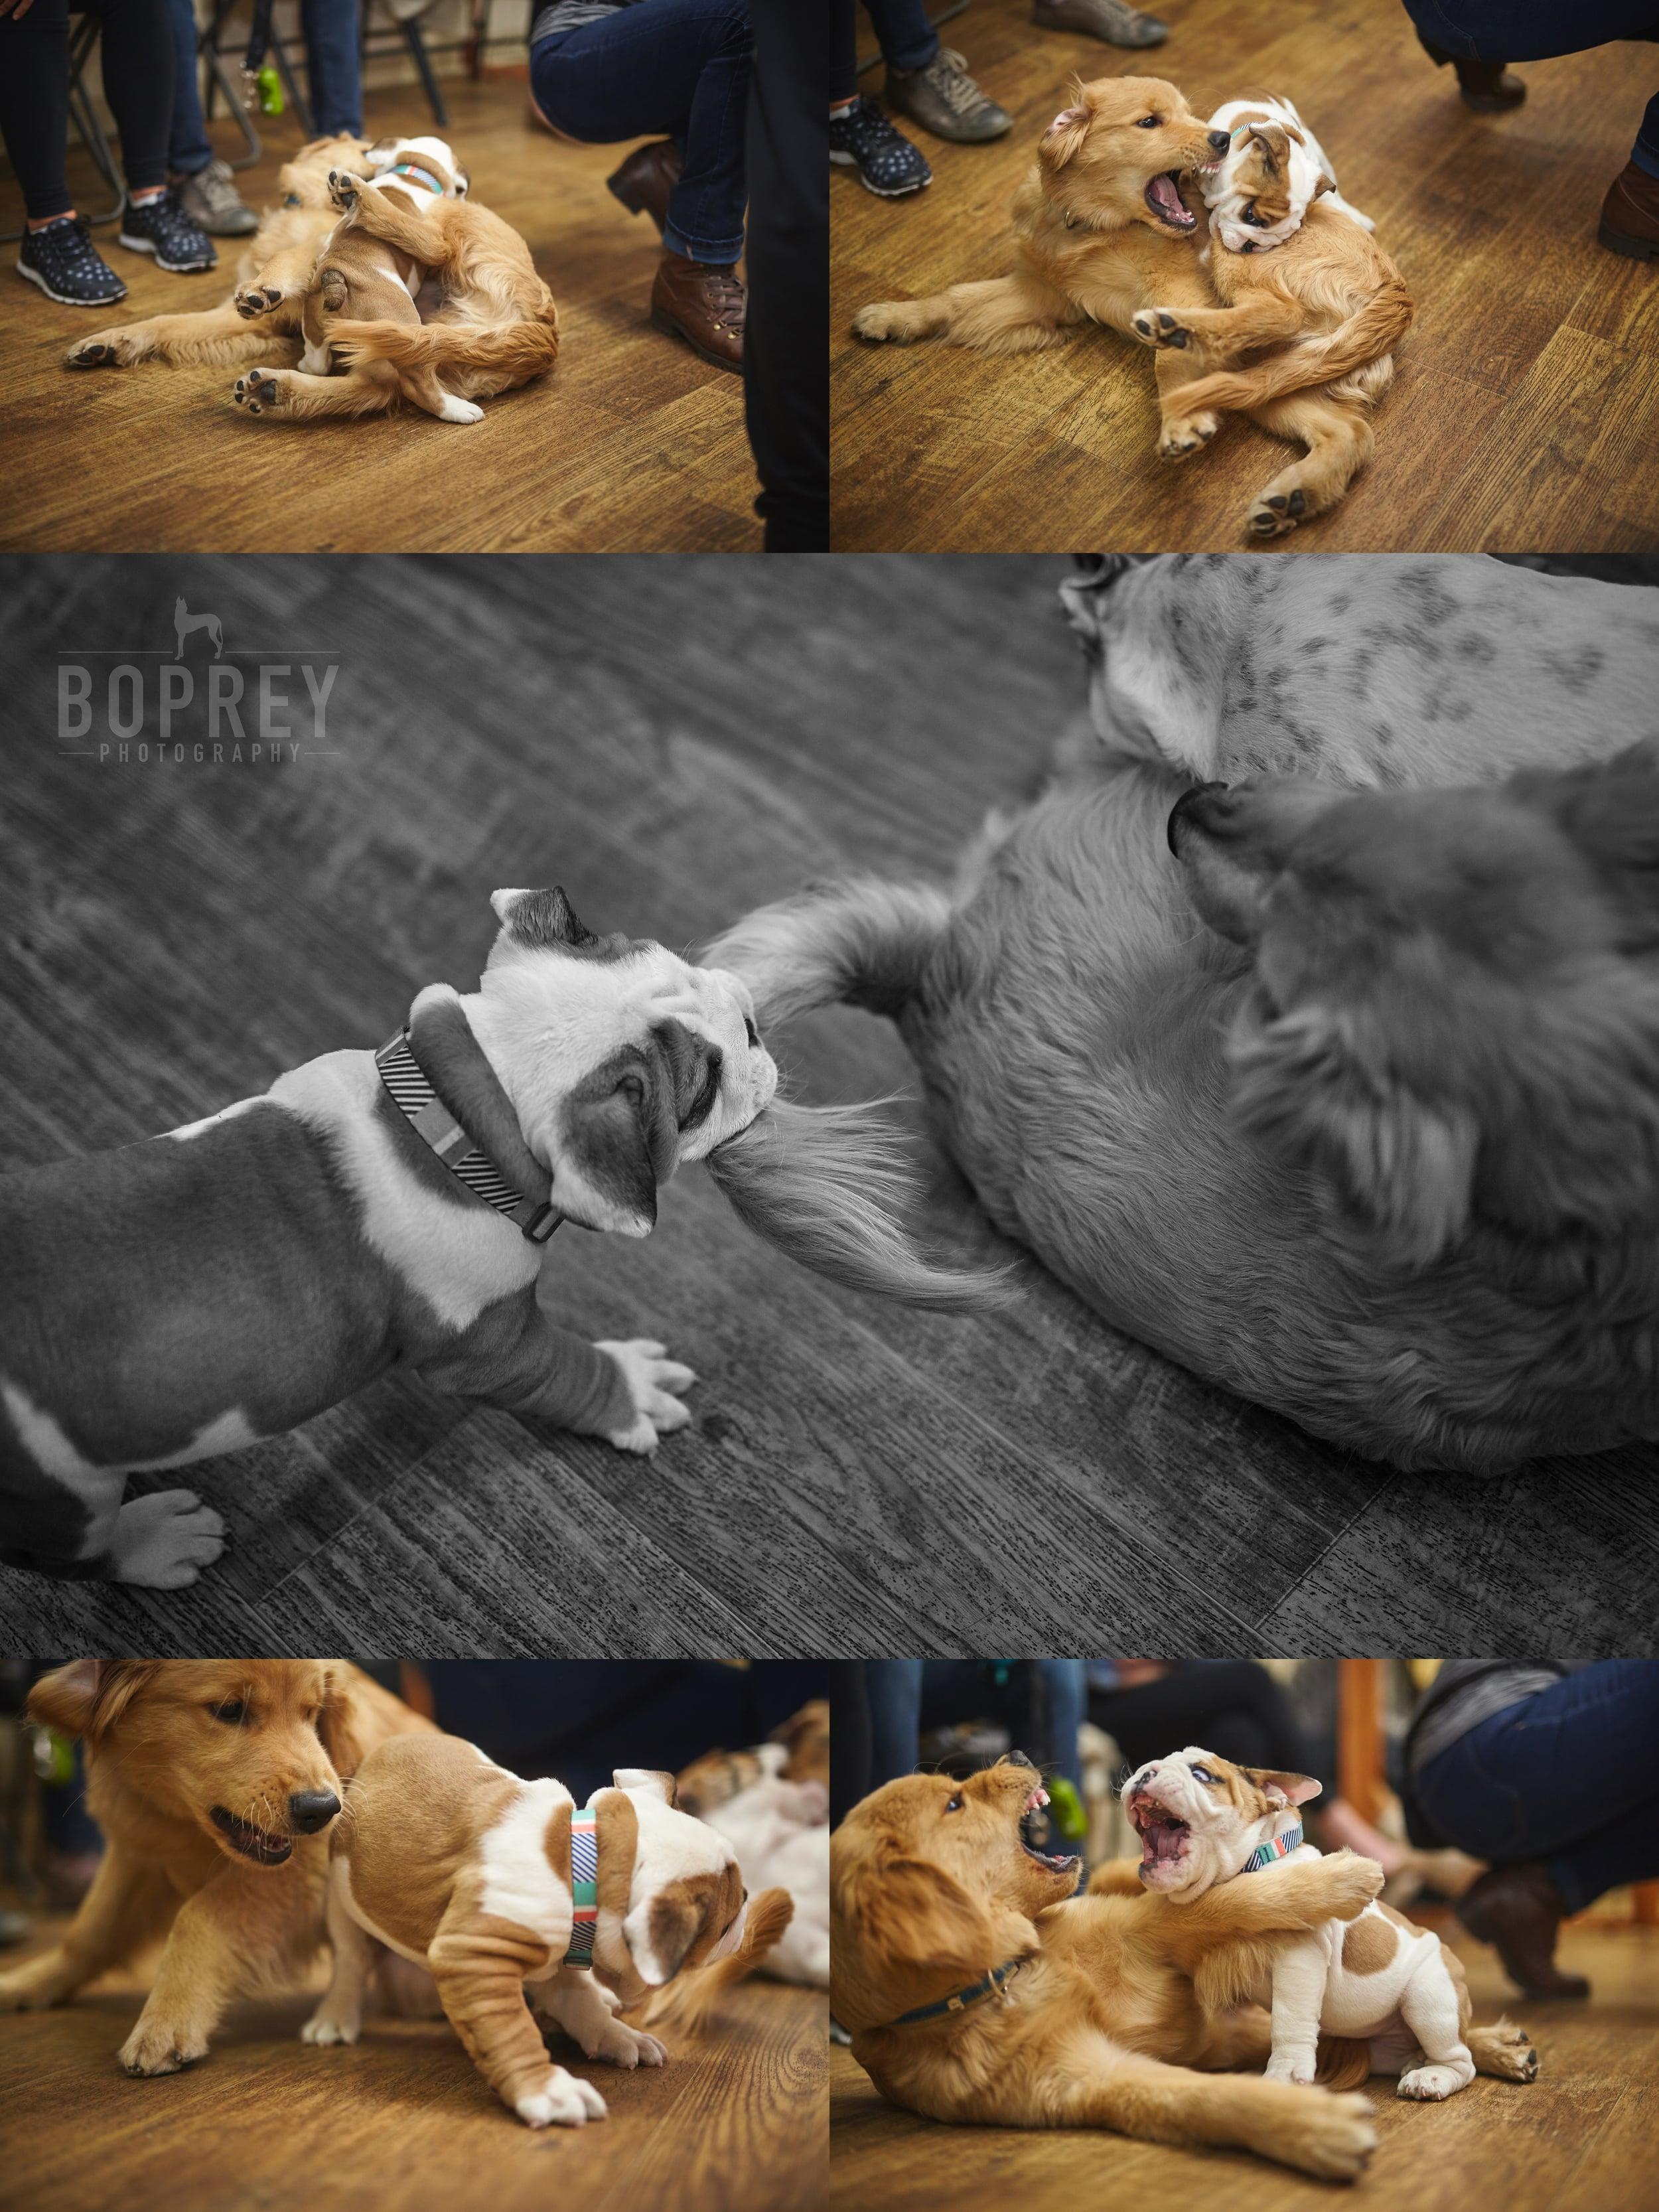 Rosie the English Bulldog roughing around with Milo the Golden Retriever.